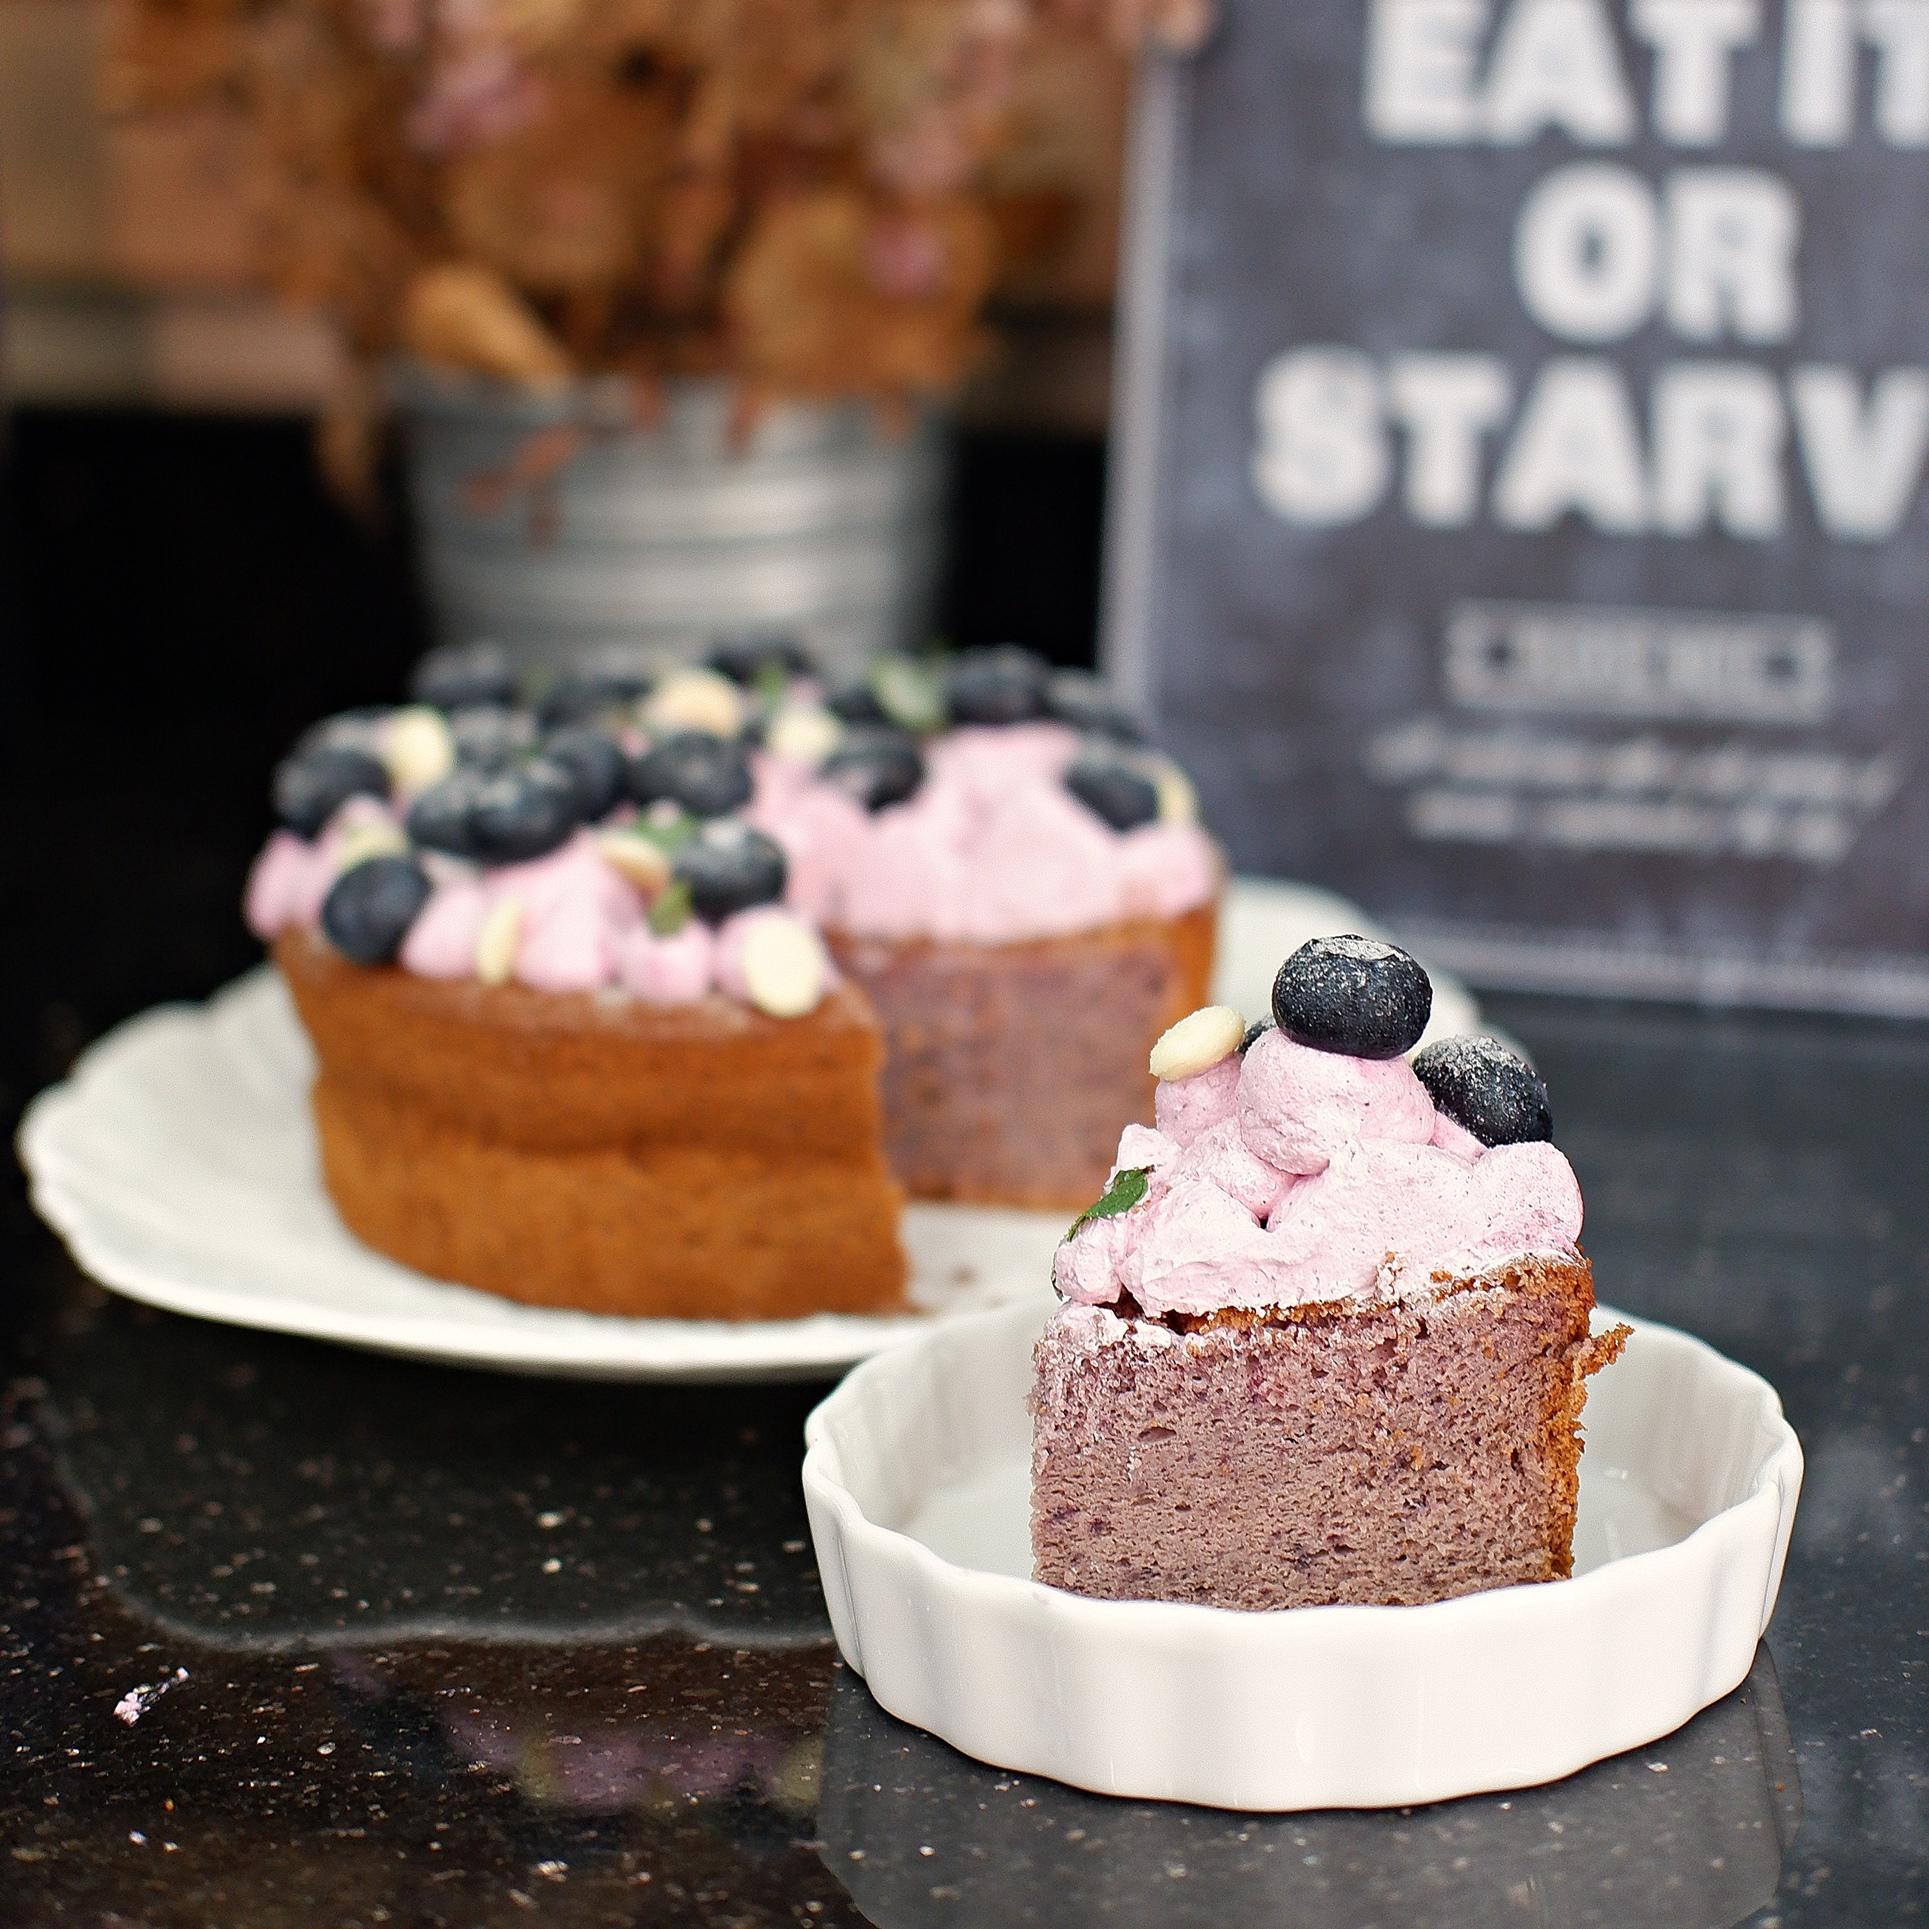 Blackcurrant Sponge Cake